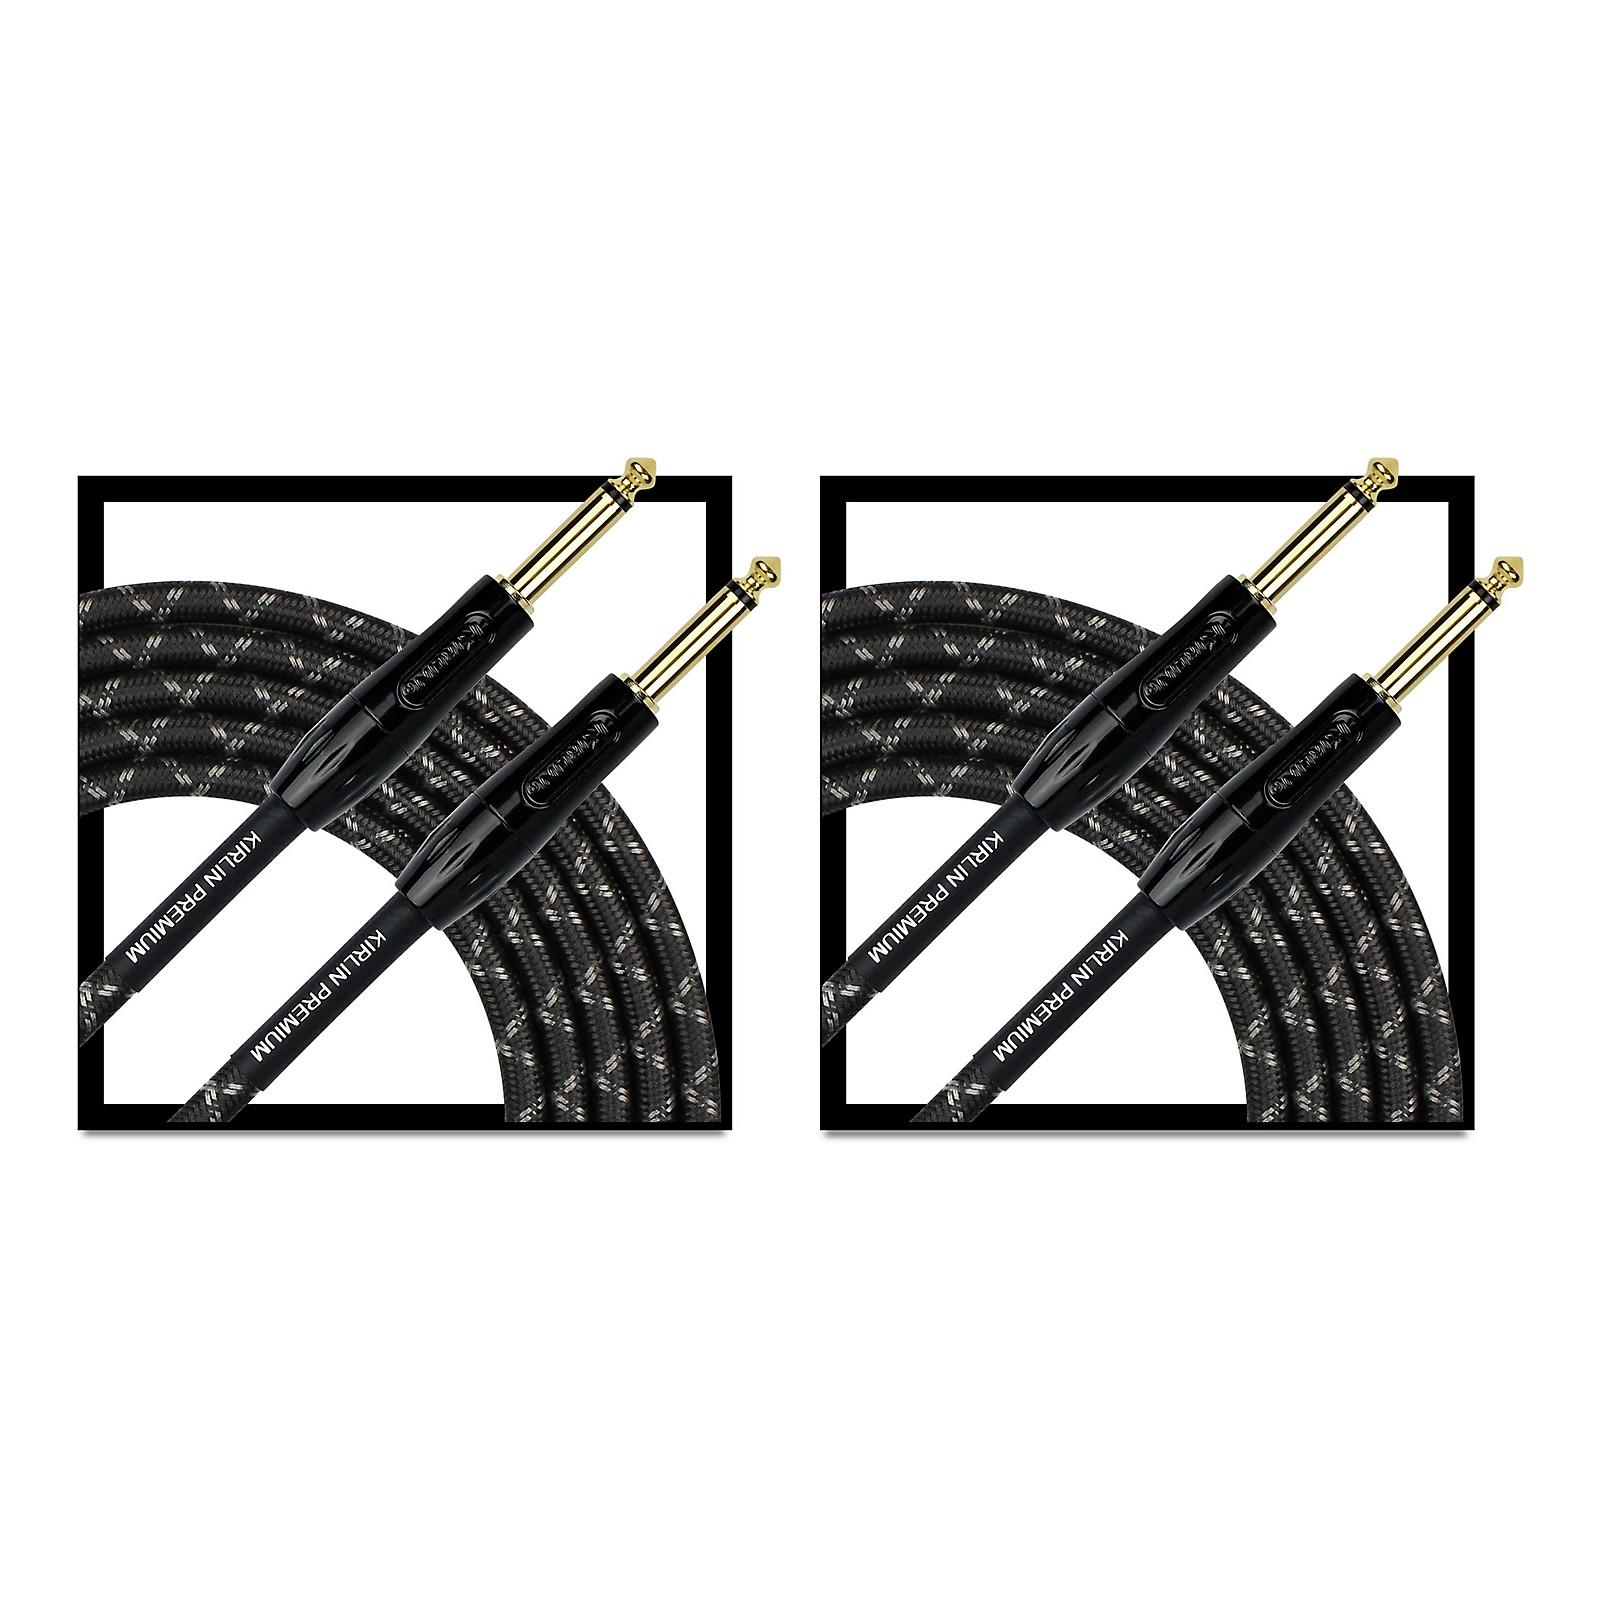 KIRLIN Premium Plus Instrument Cable 20' - 2-Pack